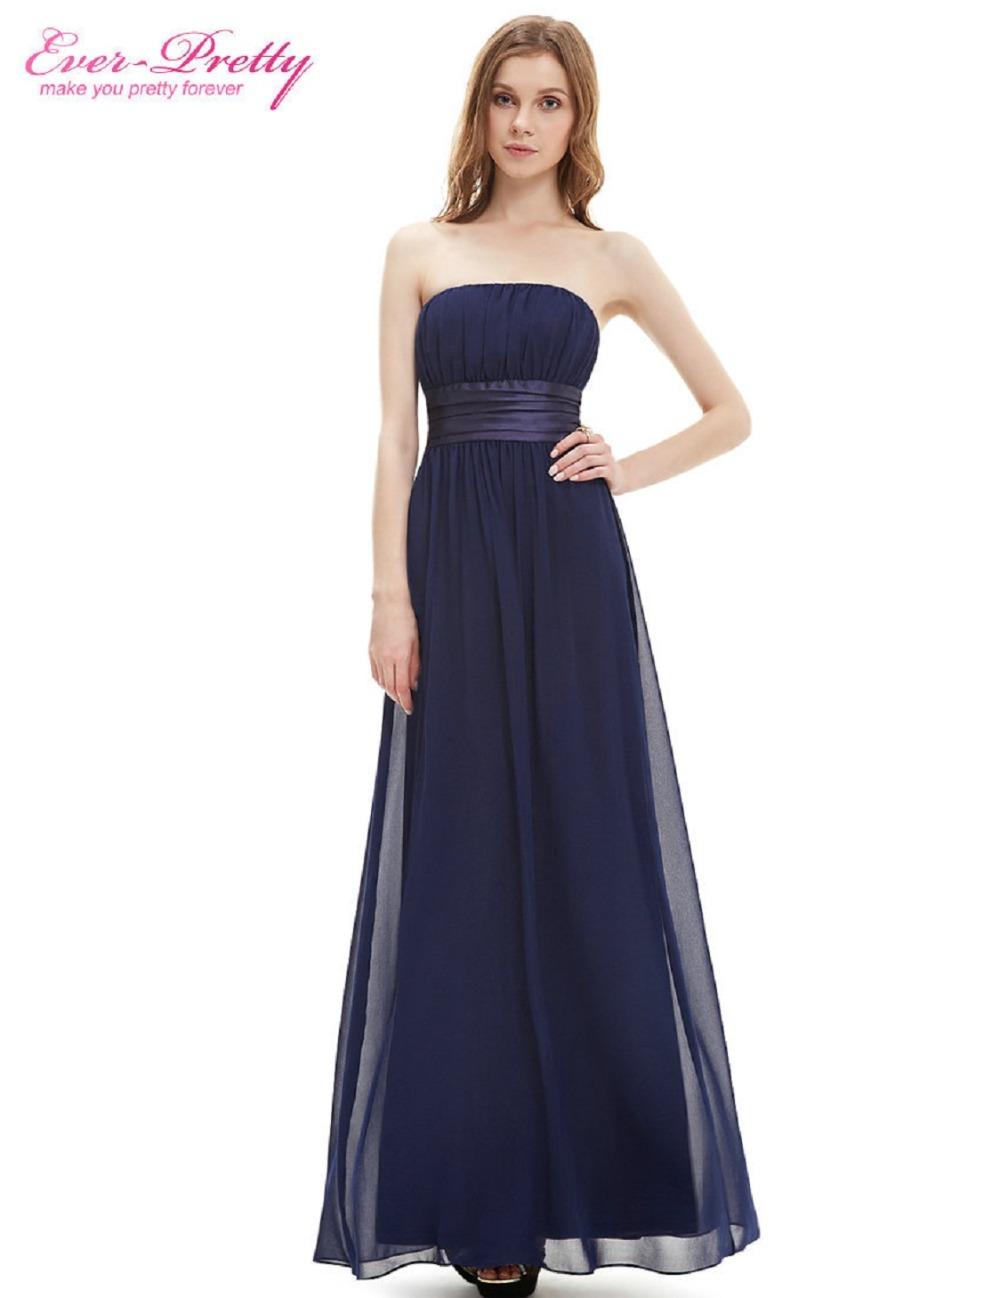 Maxi bridesmaid dresses new sexy long bridesmaid dresses for Long maxi dresses for weddings